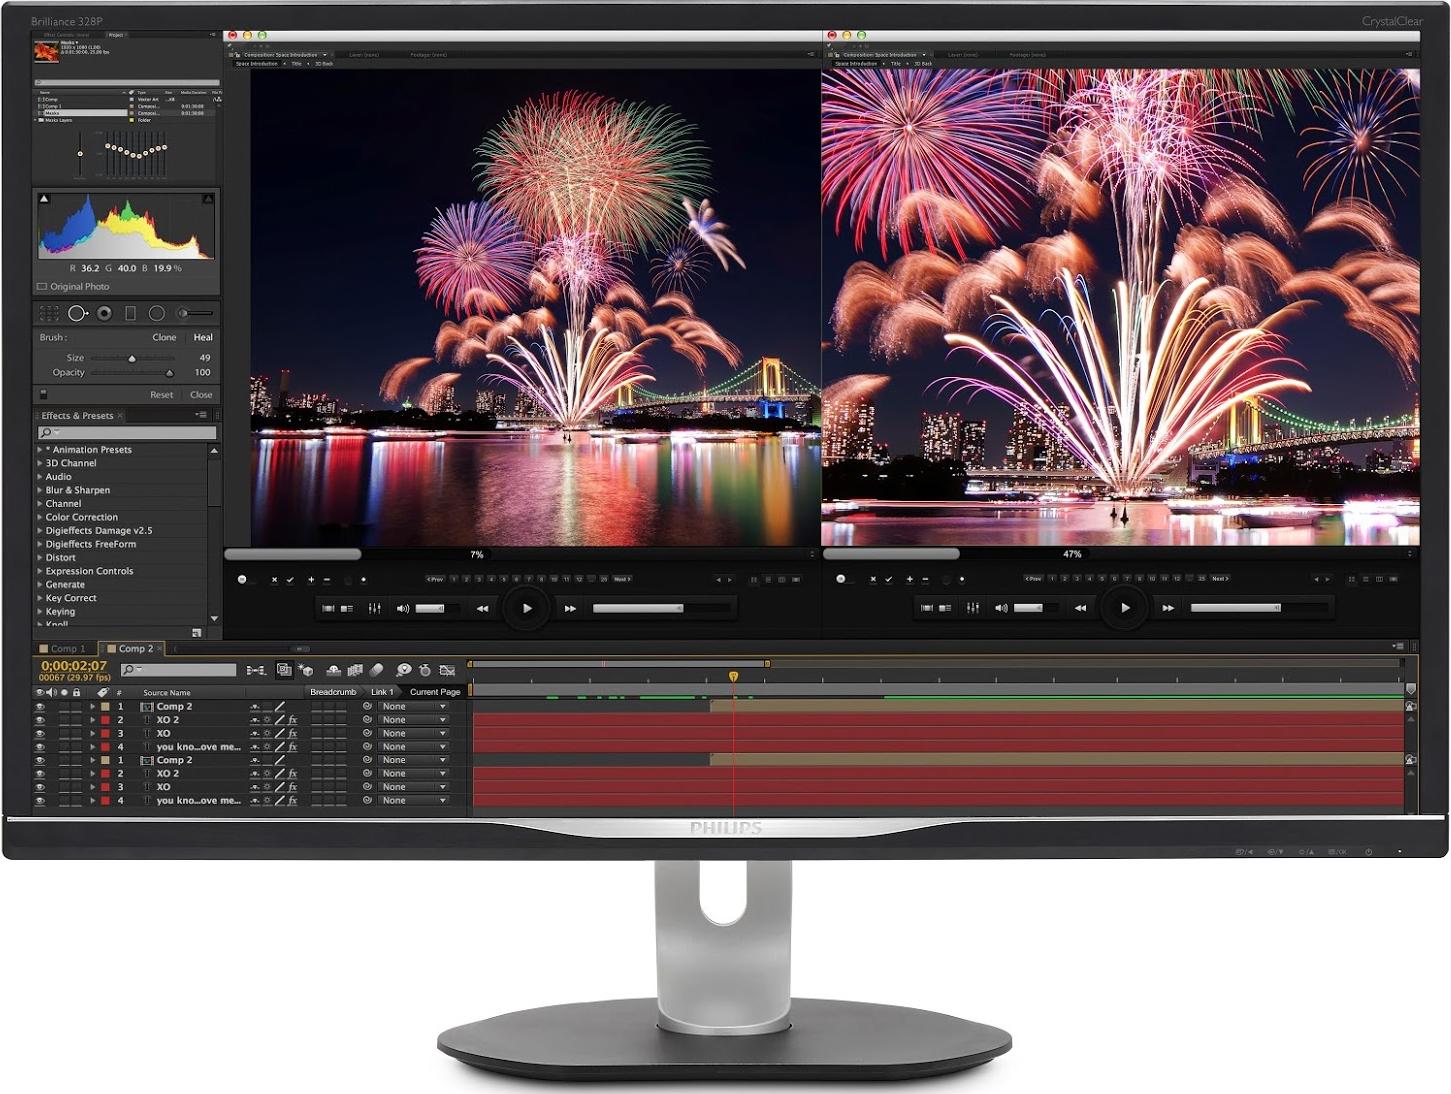 Philips 328P6VU Professional 4K Display: DisplayHDR 600, USB